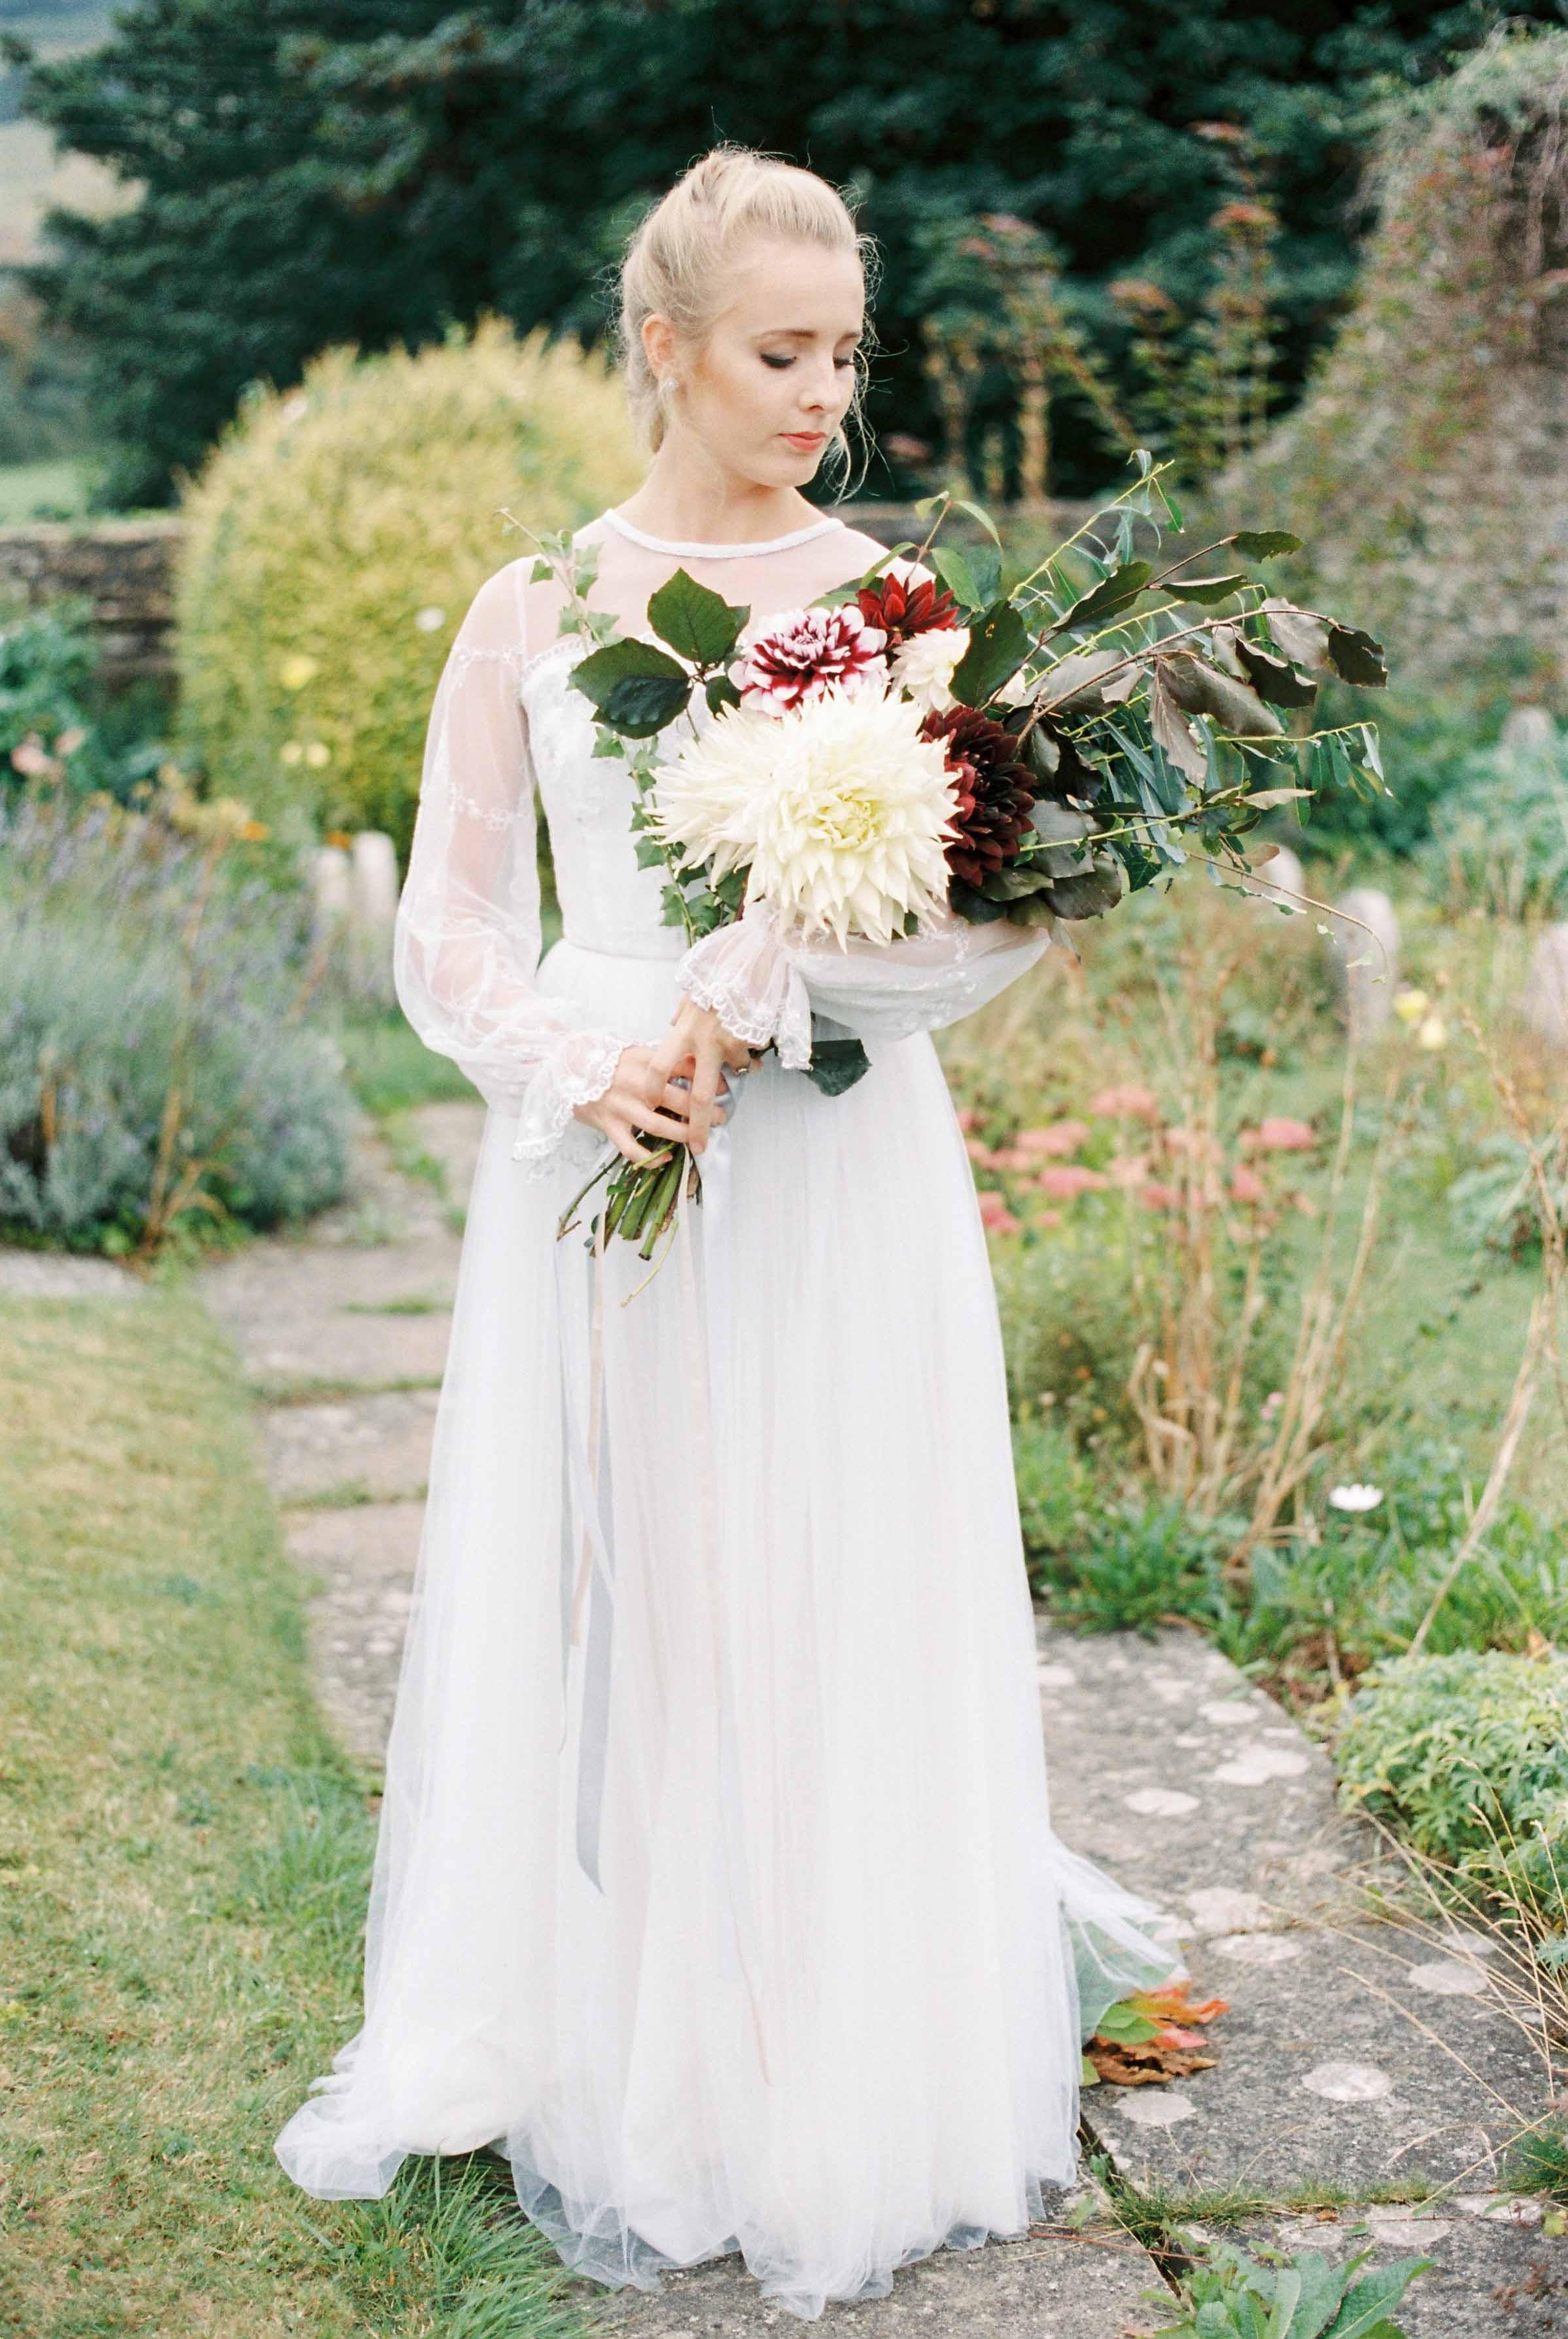 dorset-fine-art-wedding-photographer_amelia_carmencita_lores-3-of-24